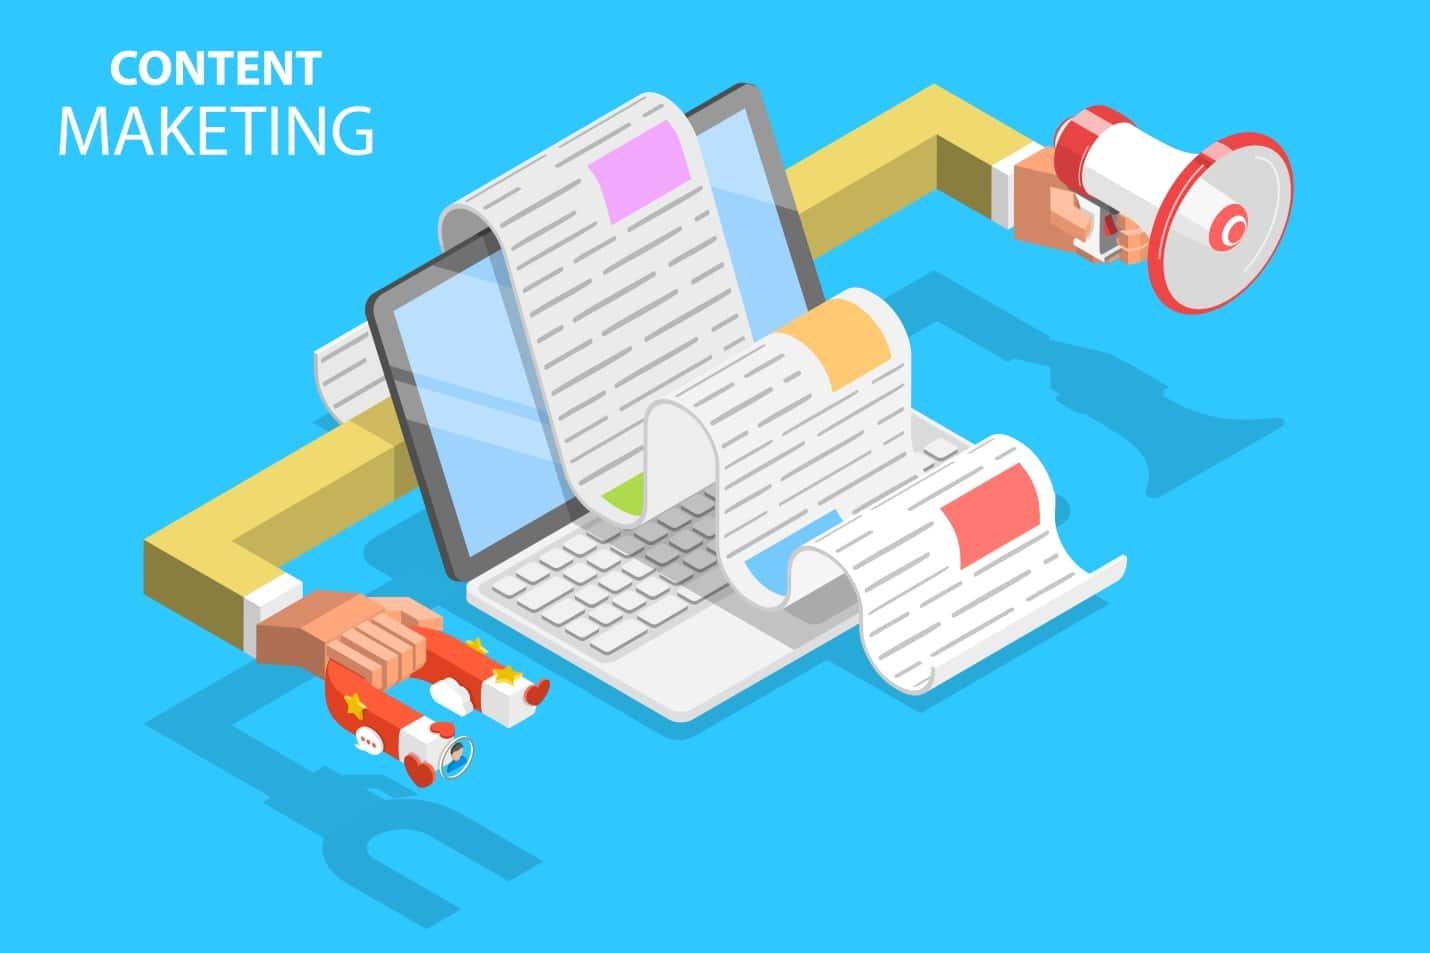 Lead Generation Through Content Marketing 2019